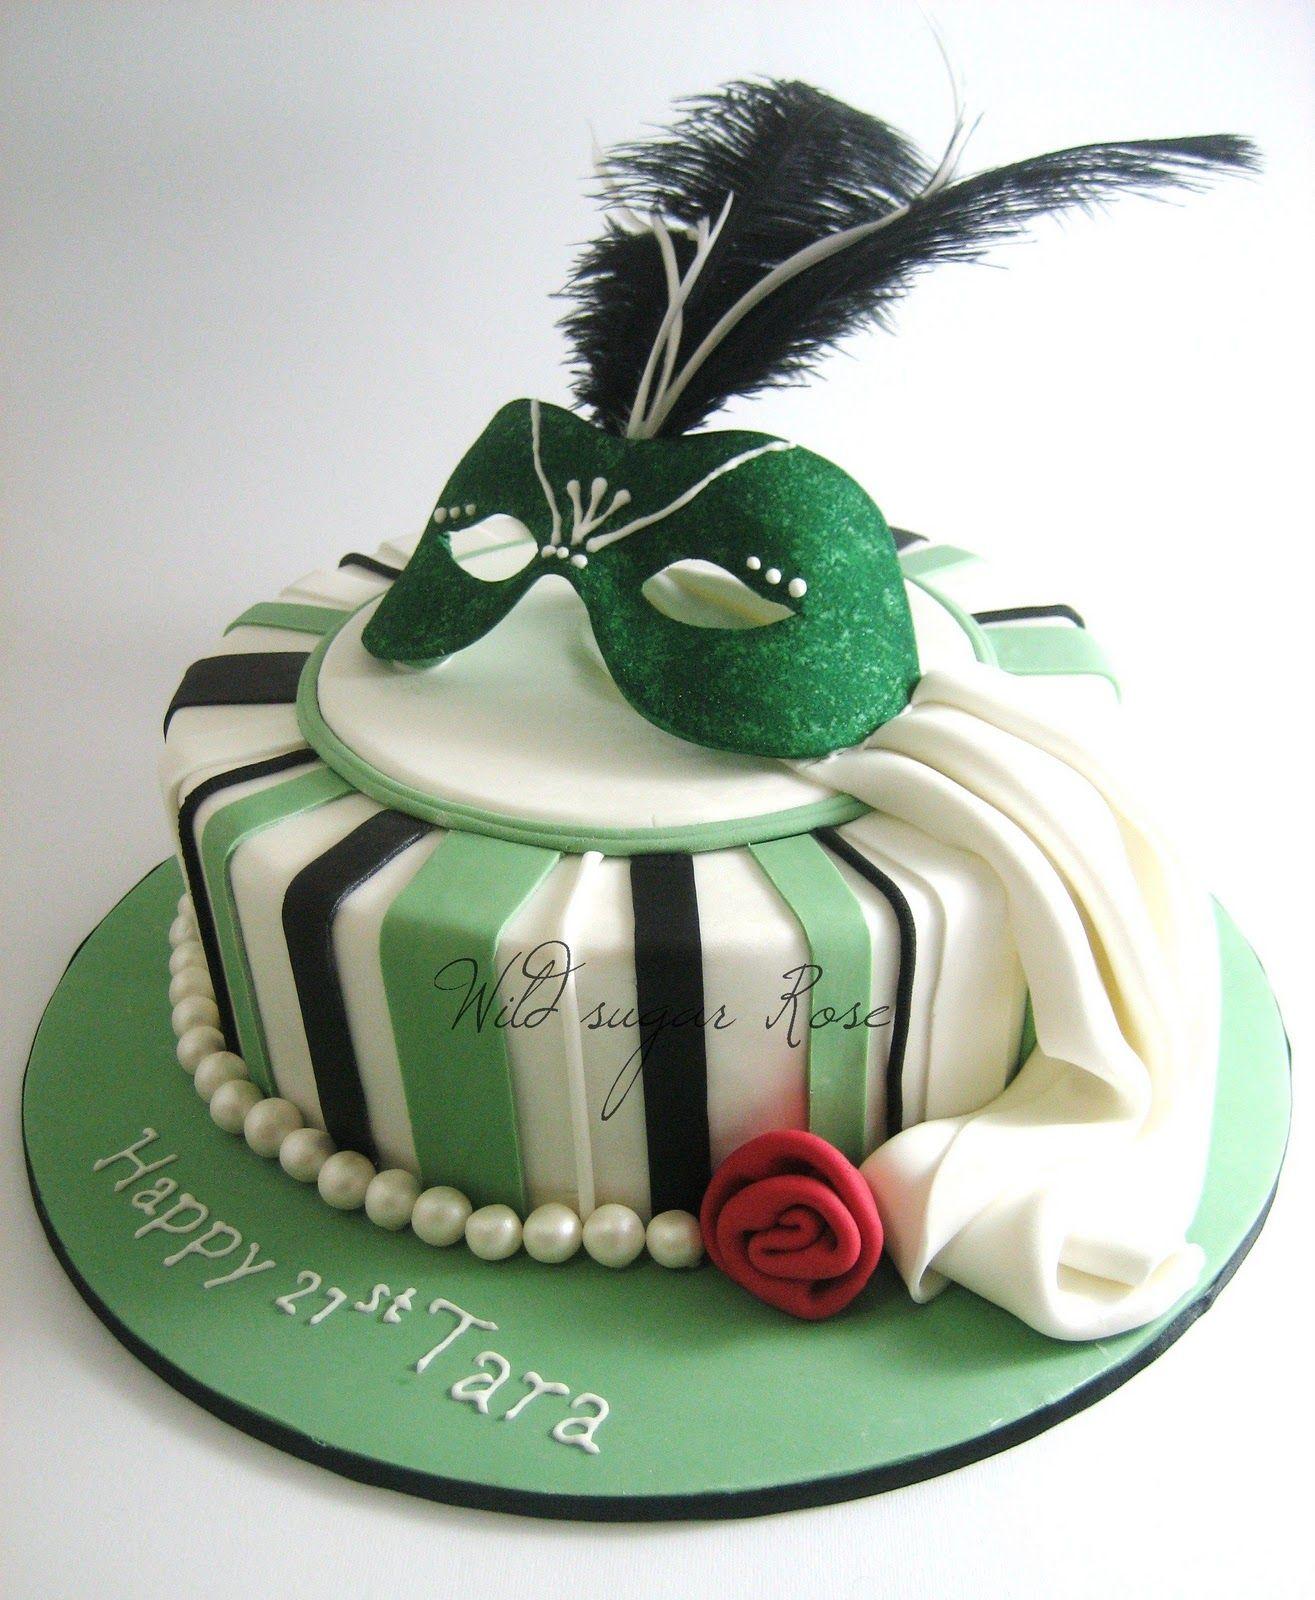 Wedding Cake Decorating Classes: Image Detail For -Wild Sugar Rose